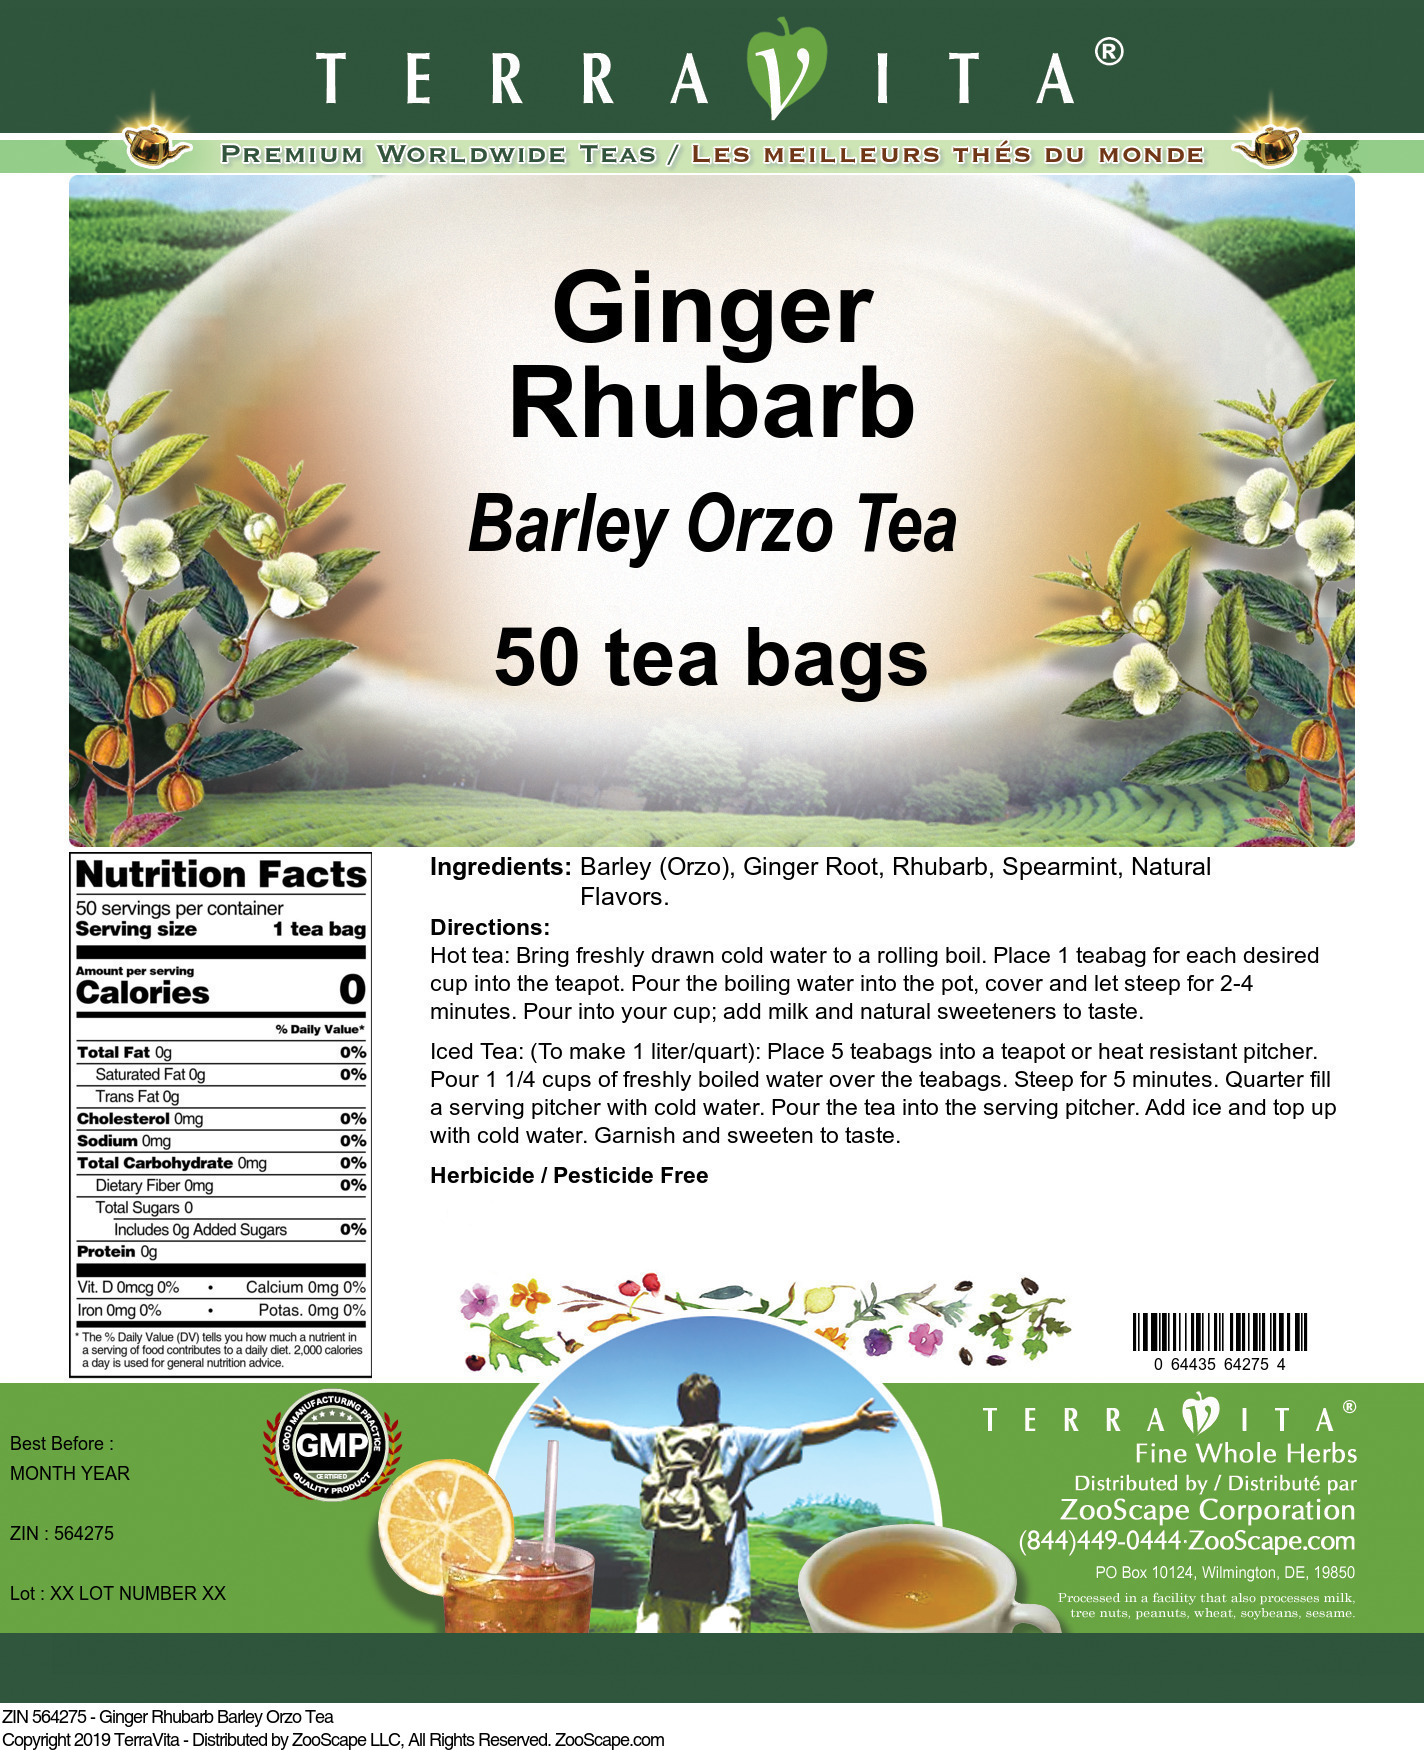 Ginger Rhubarb Barley Orzo